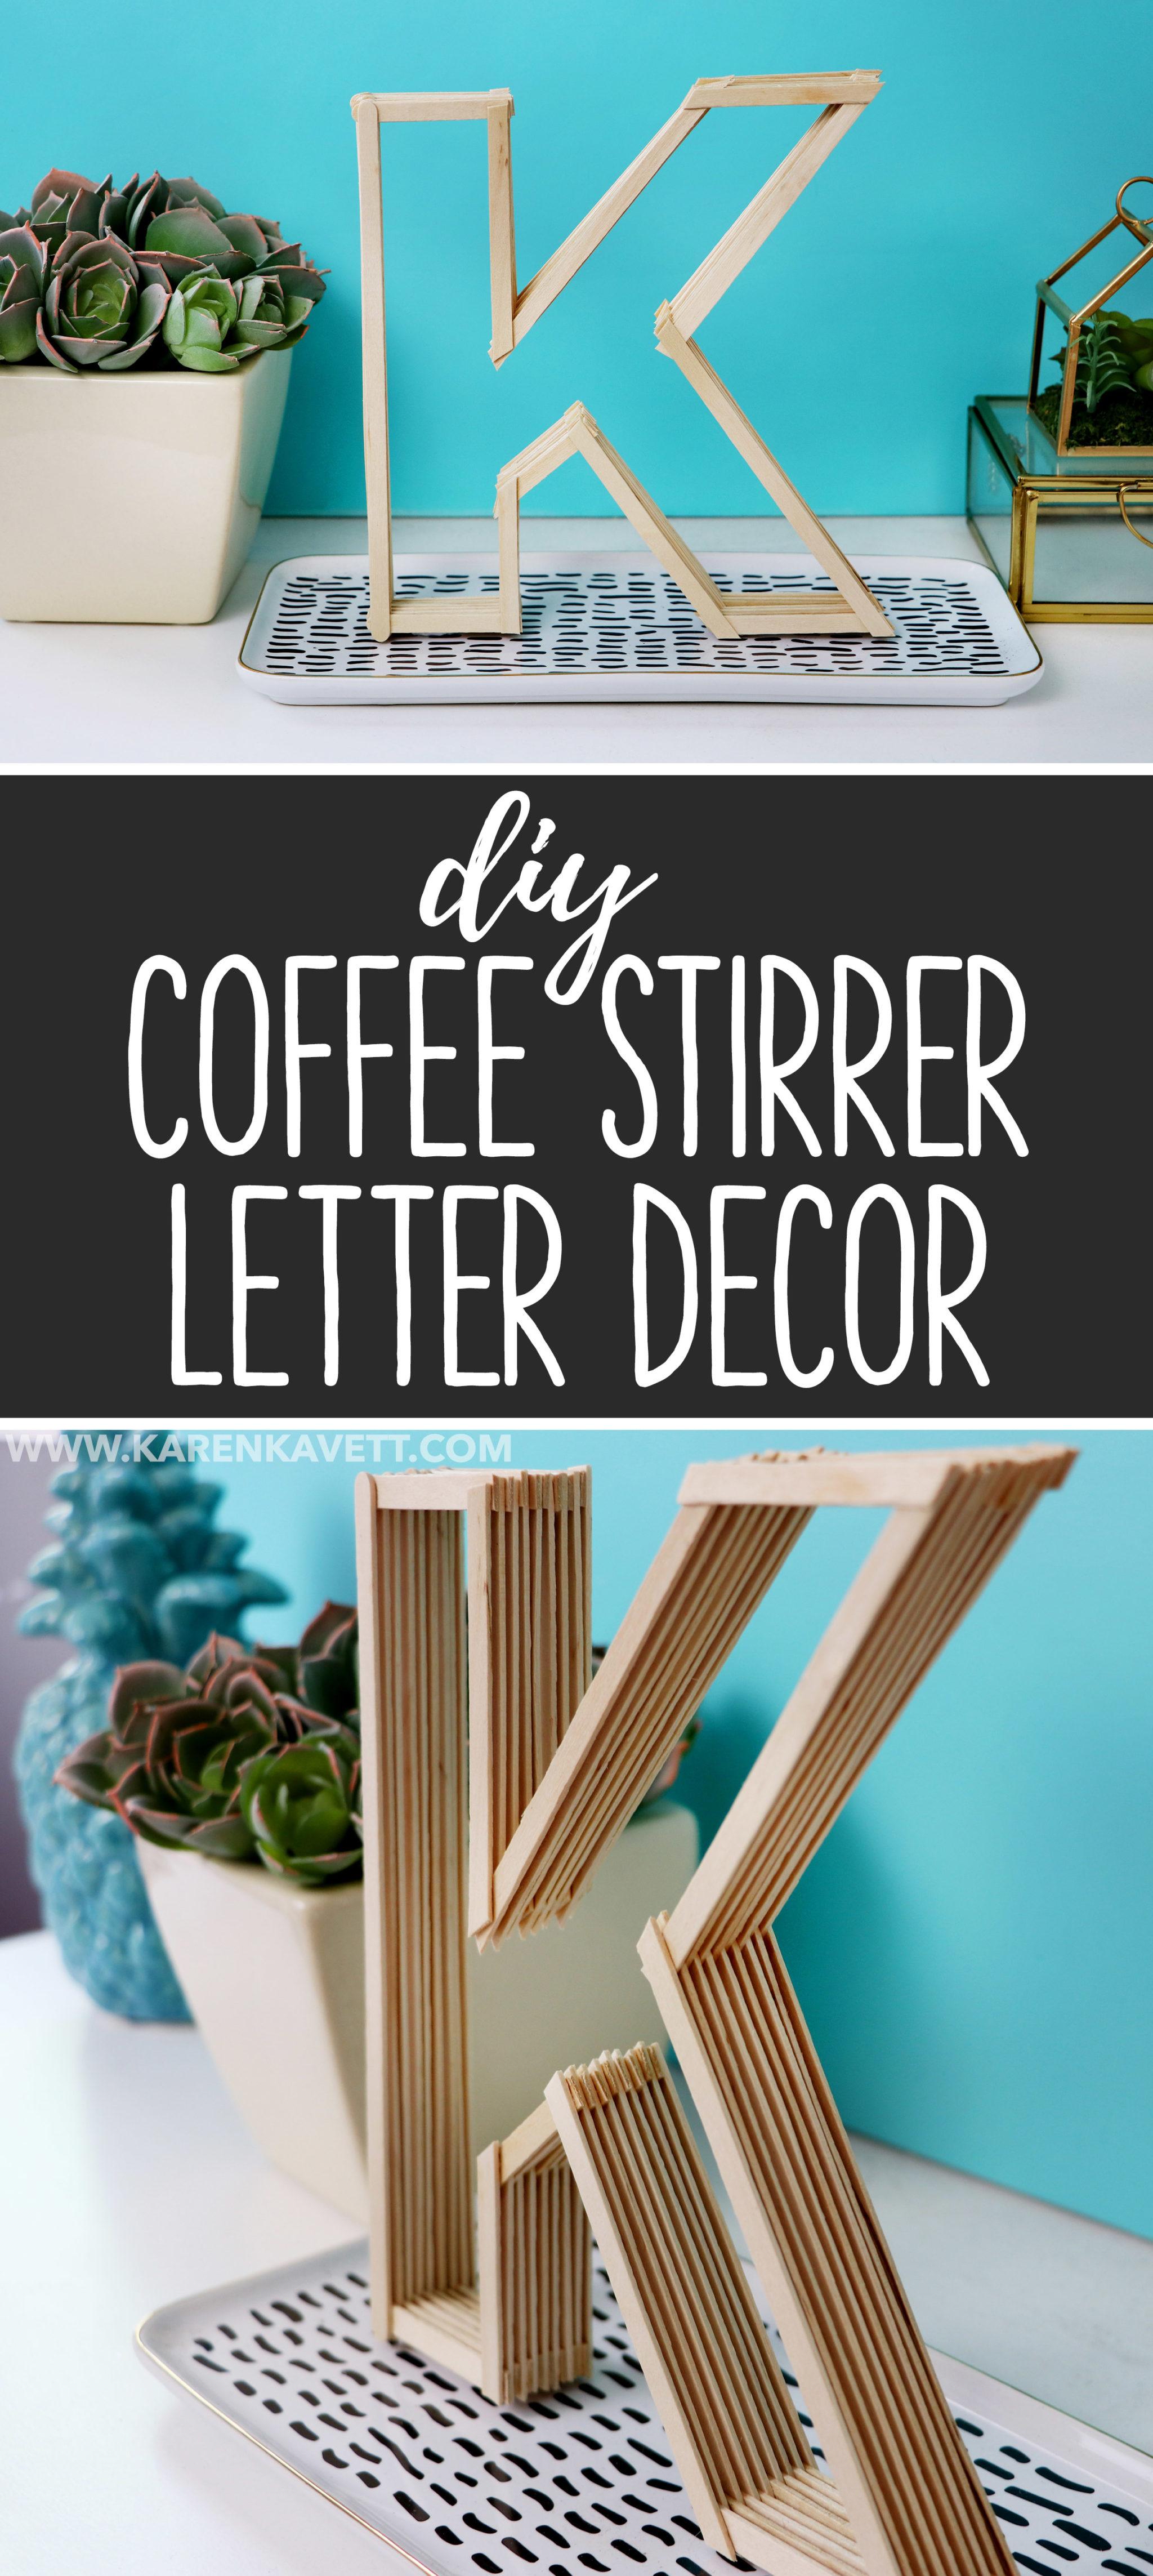 Diy Letters Made From Coffee Stirrers Easy Room Decor Karen Kavett